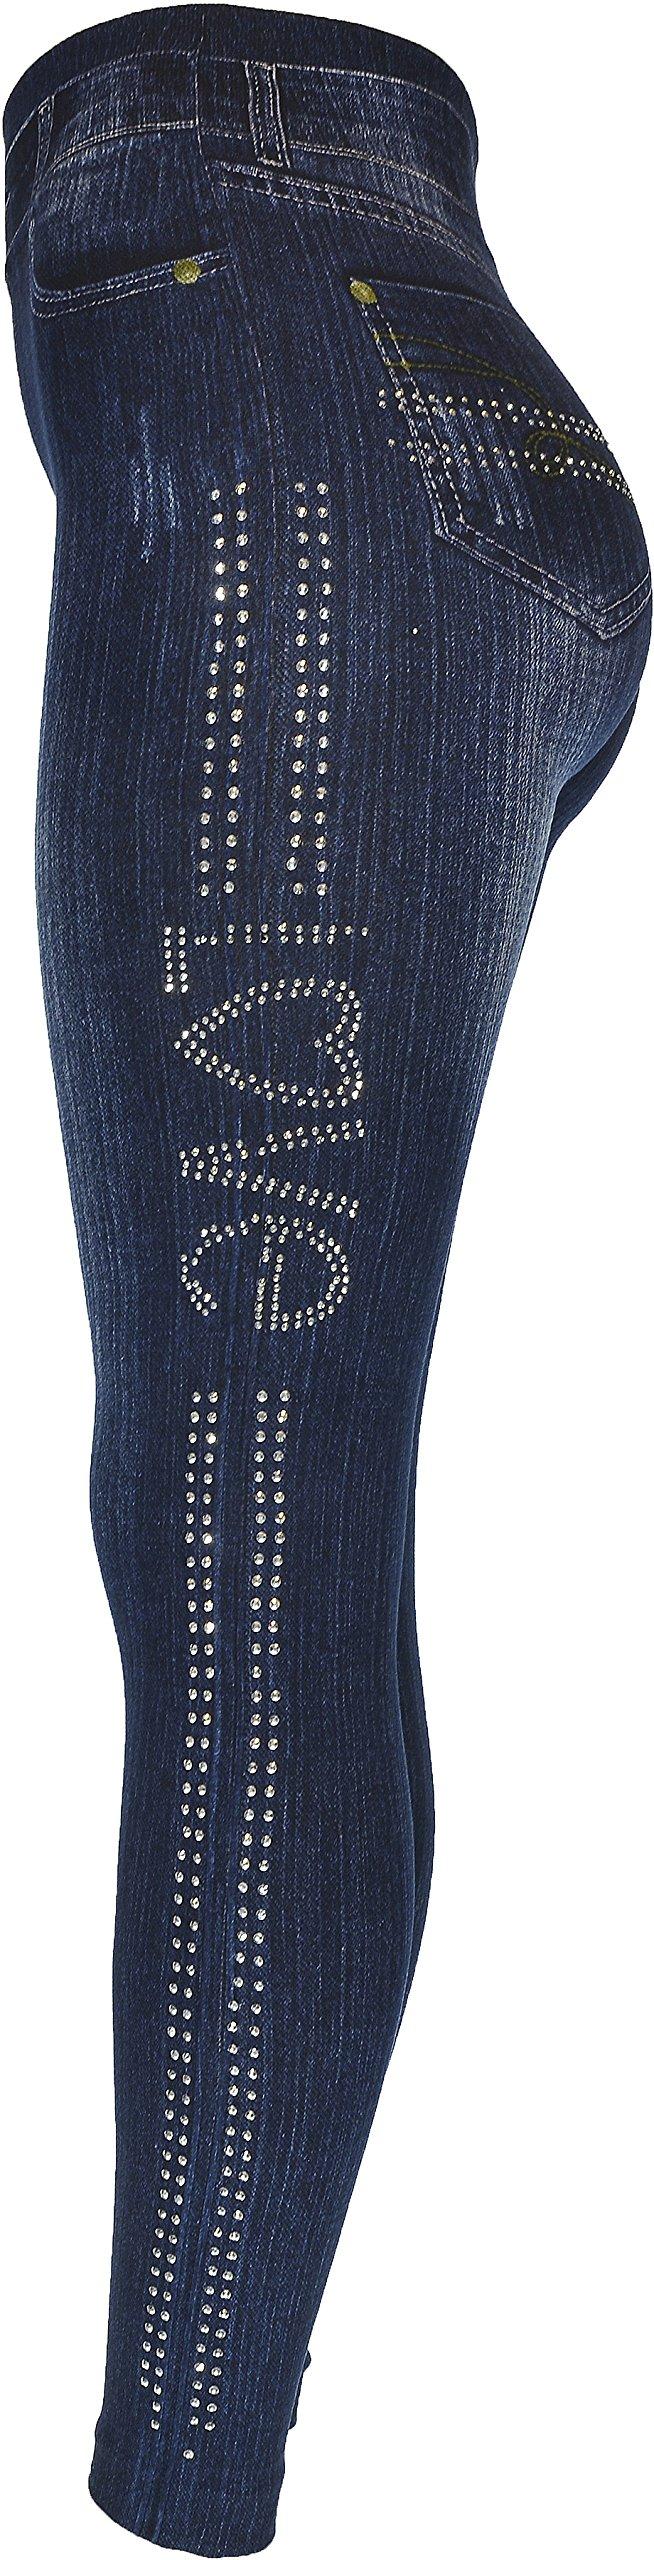 Hand By Hand Aprileo Women's Leggings Jeans Look Printed Stretch [Love Dark Denim](One Size)